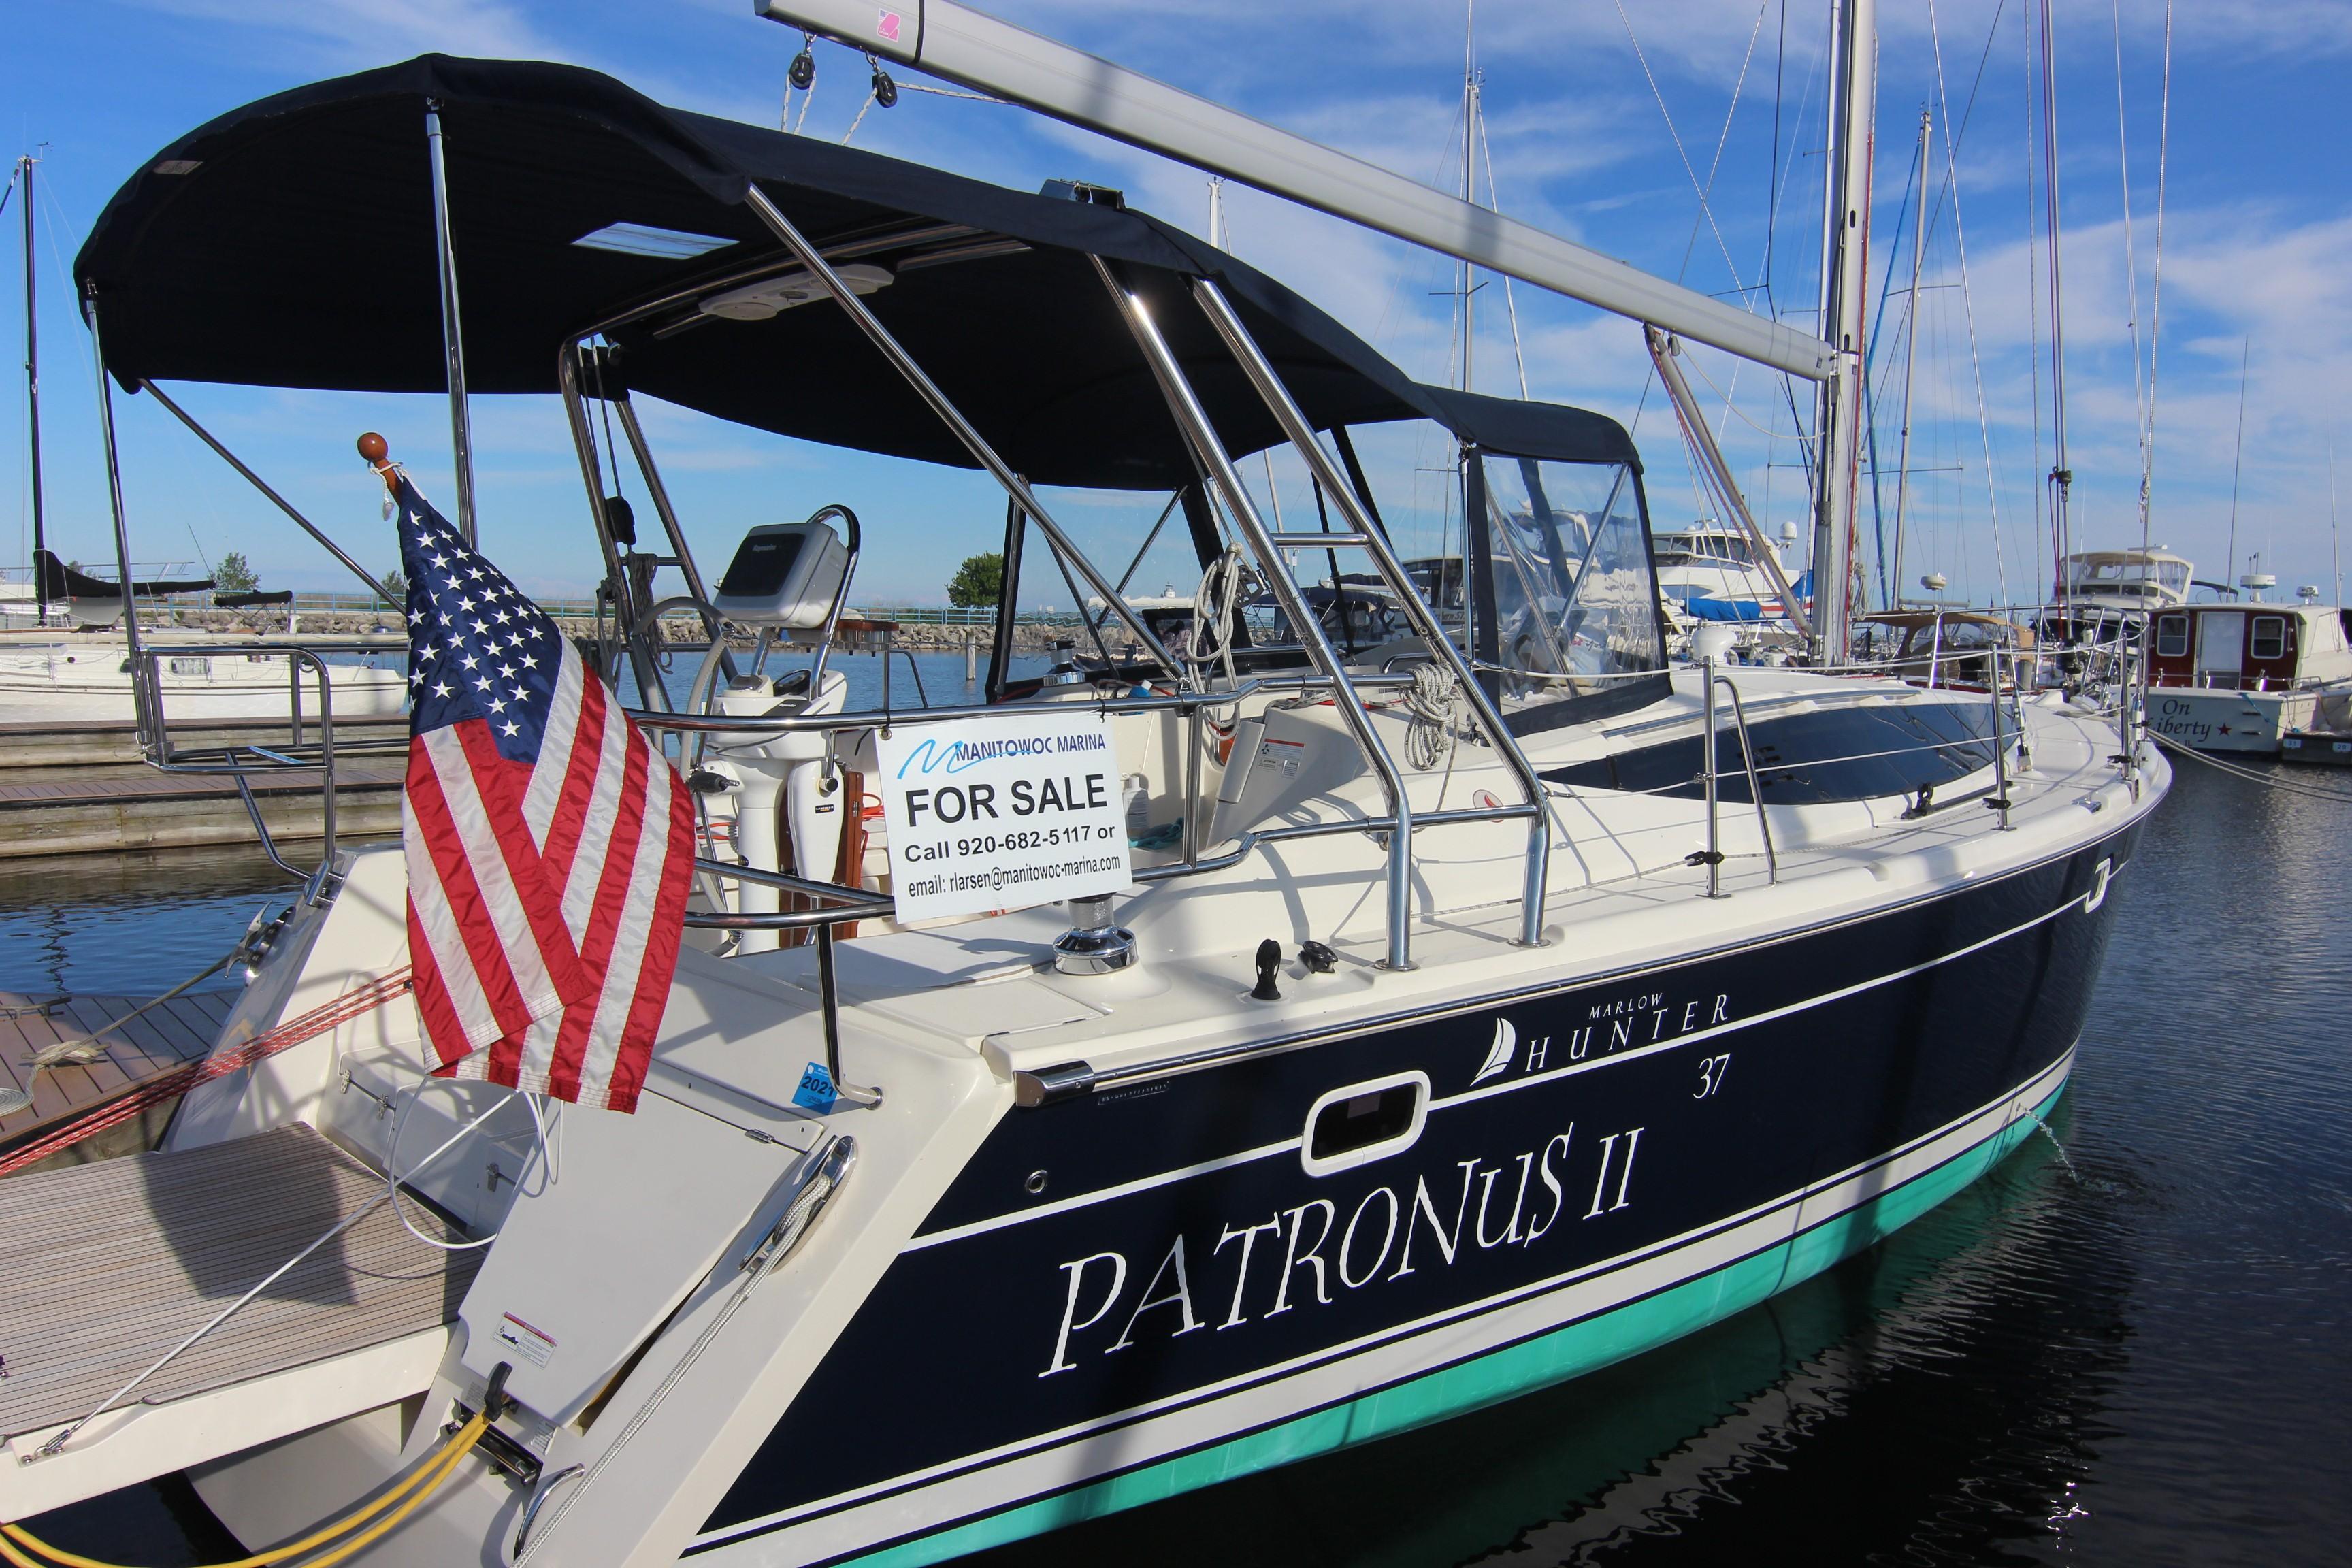 39 Hunter Patronus II 2015 Manitowoc | Denison Yacht Sales